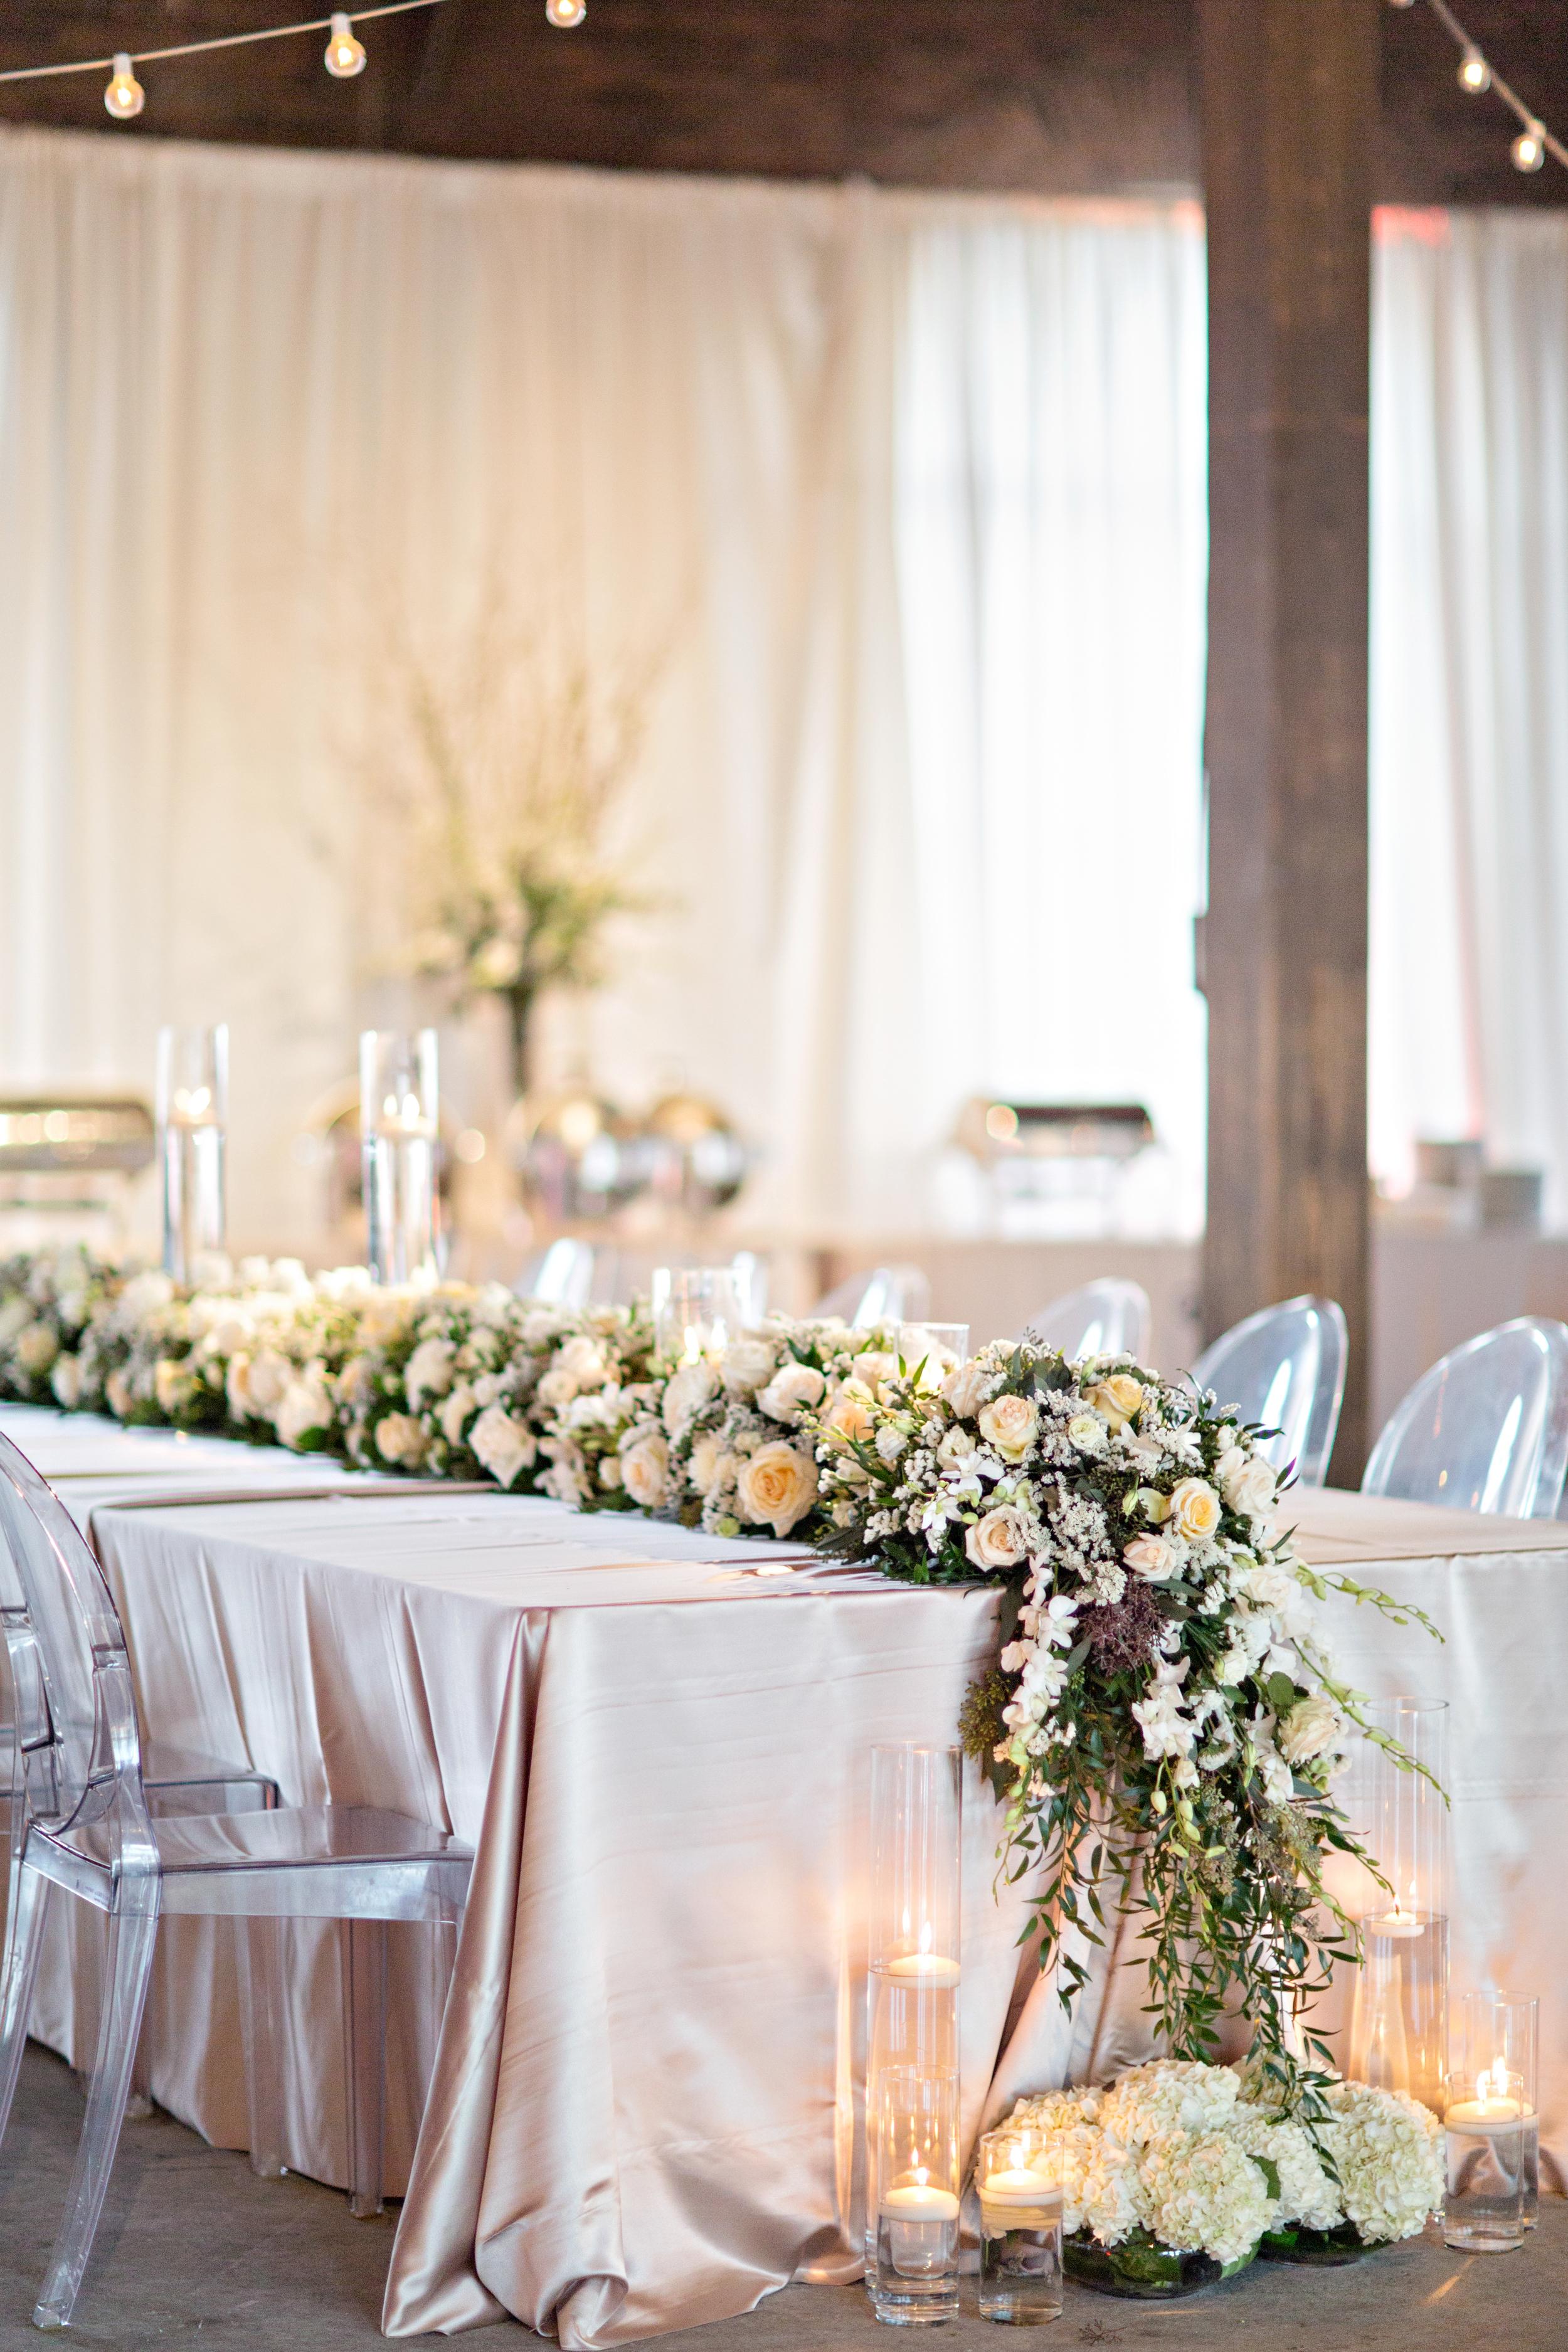 wedding-fineryboutique-finerydesign-finery-weddingcoordinators-weddingstylist-coordinator-eventplanner-reception-ghostchairs-weddingreception-tablescape-roundhousedepot-alabama-floral-swag-garland